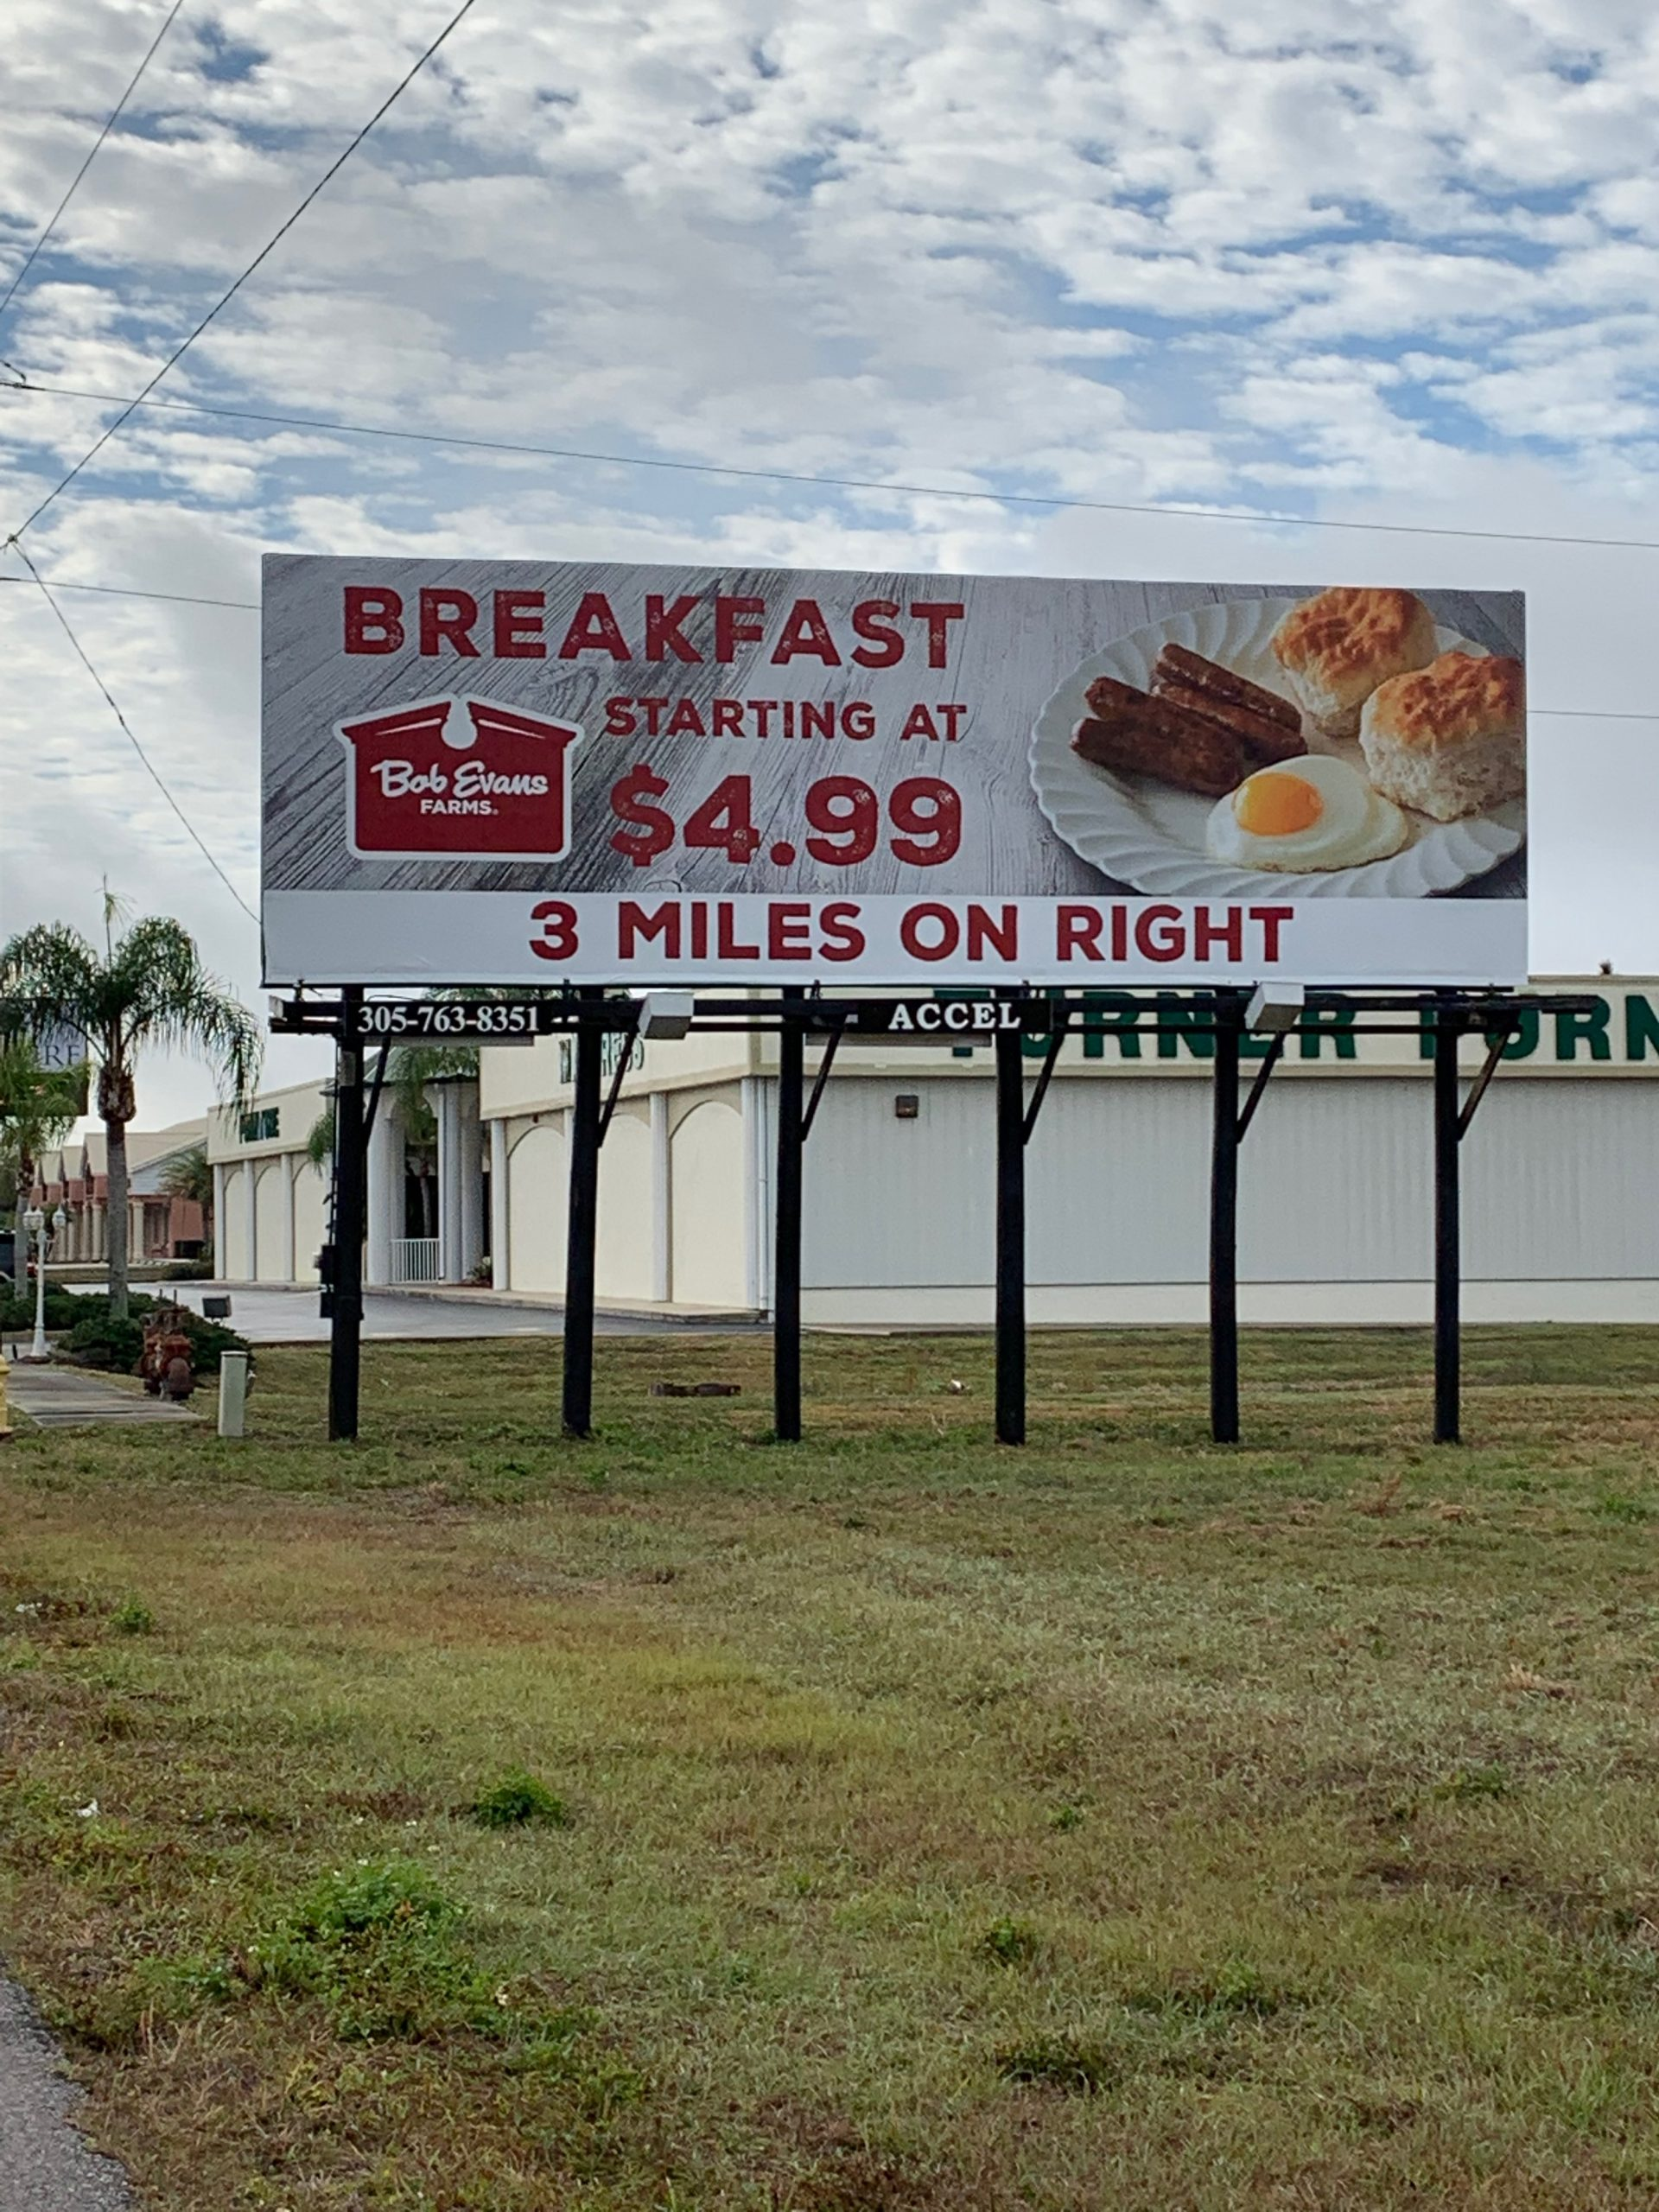 Outdoor-Advertising-Sign #131.1 RHR PoP -- 2-3-19